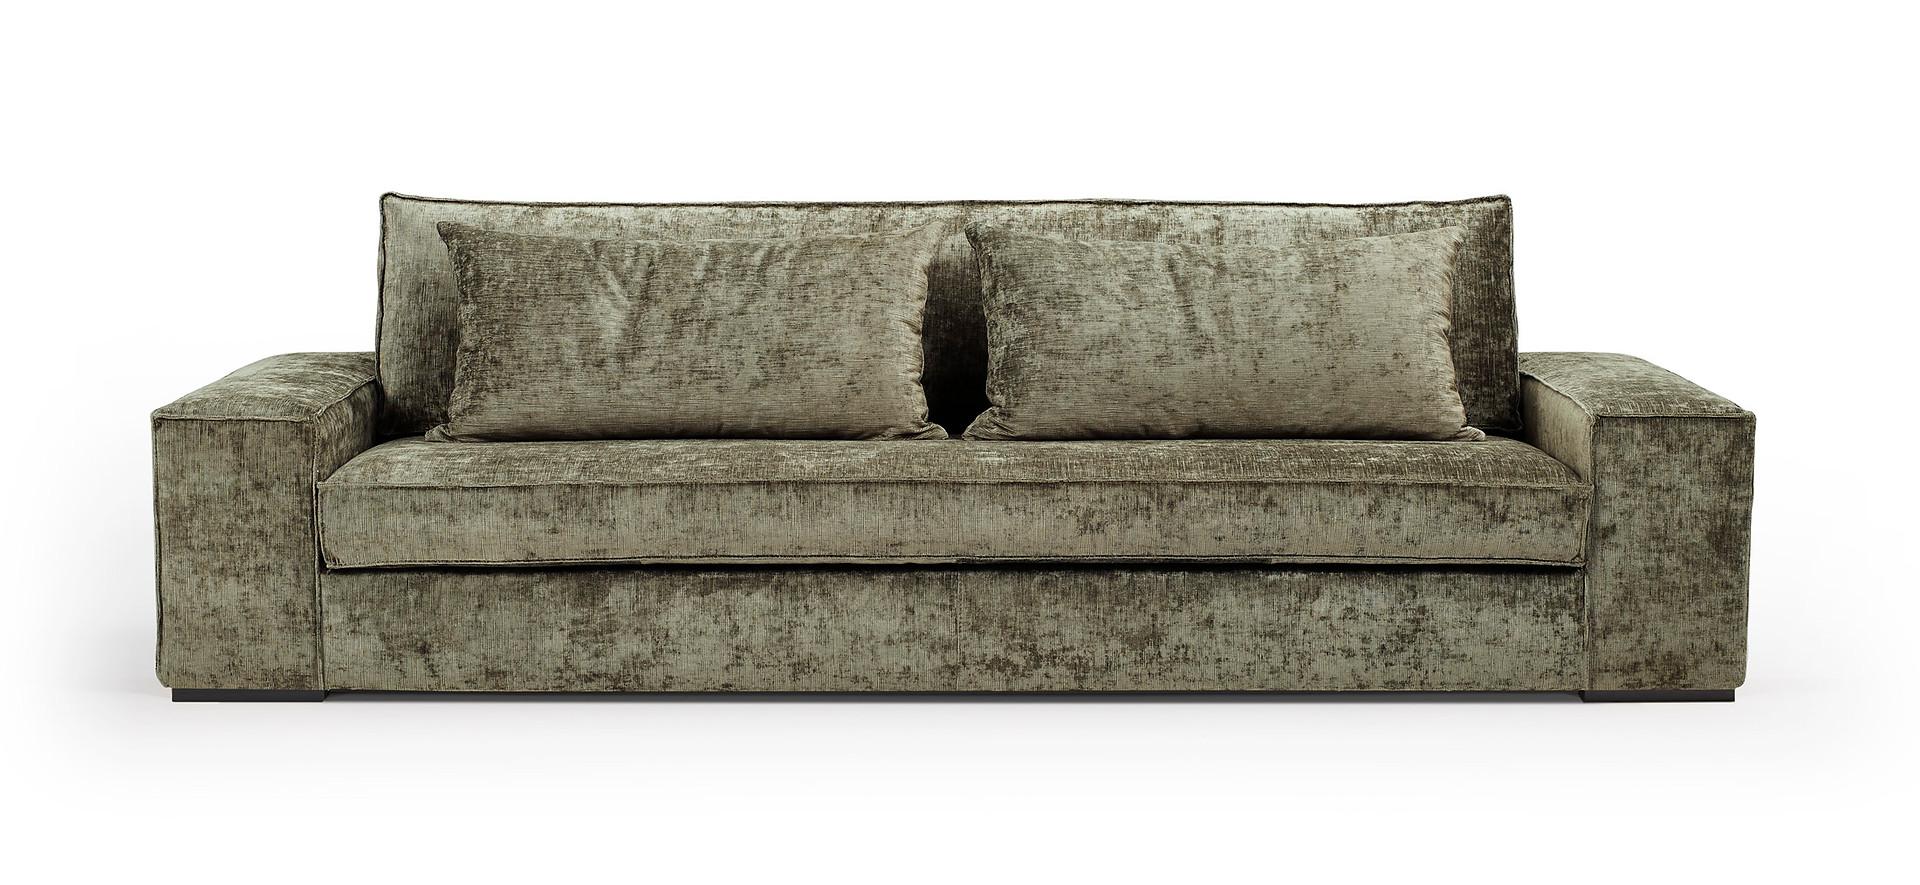 lounge-front-+-p-reni-piede-basso-nero.j